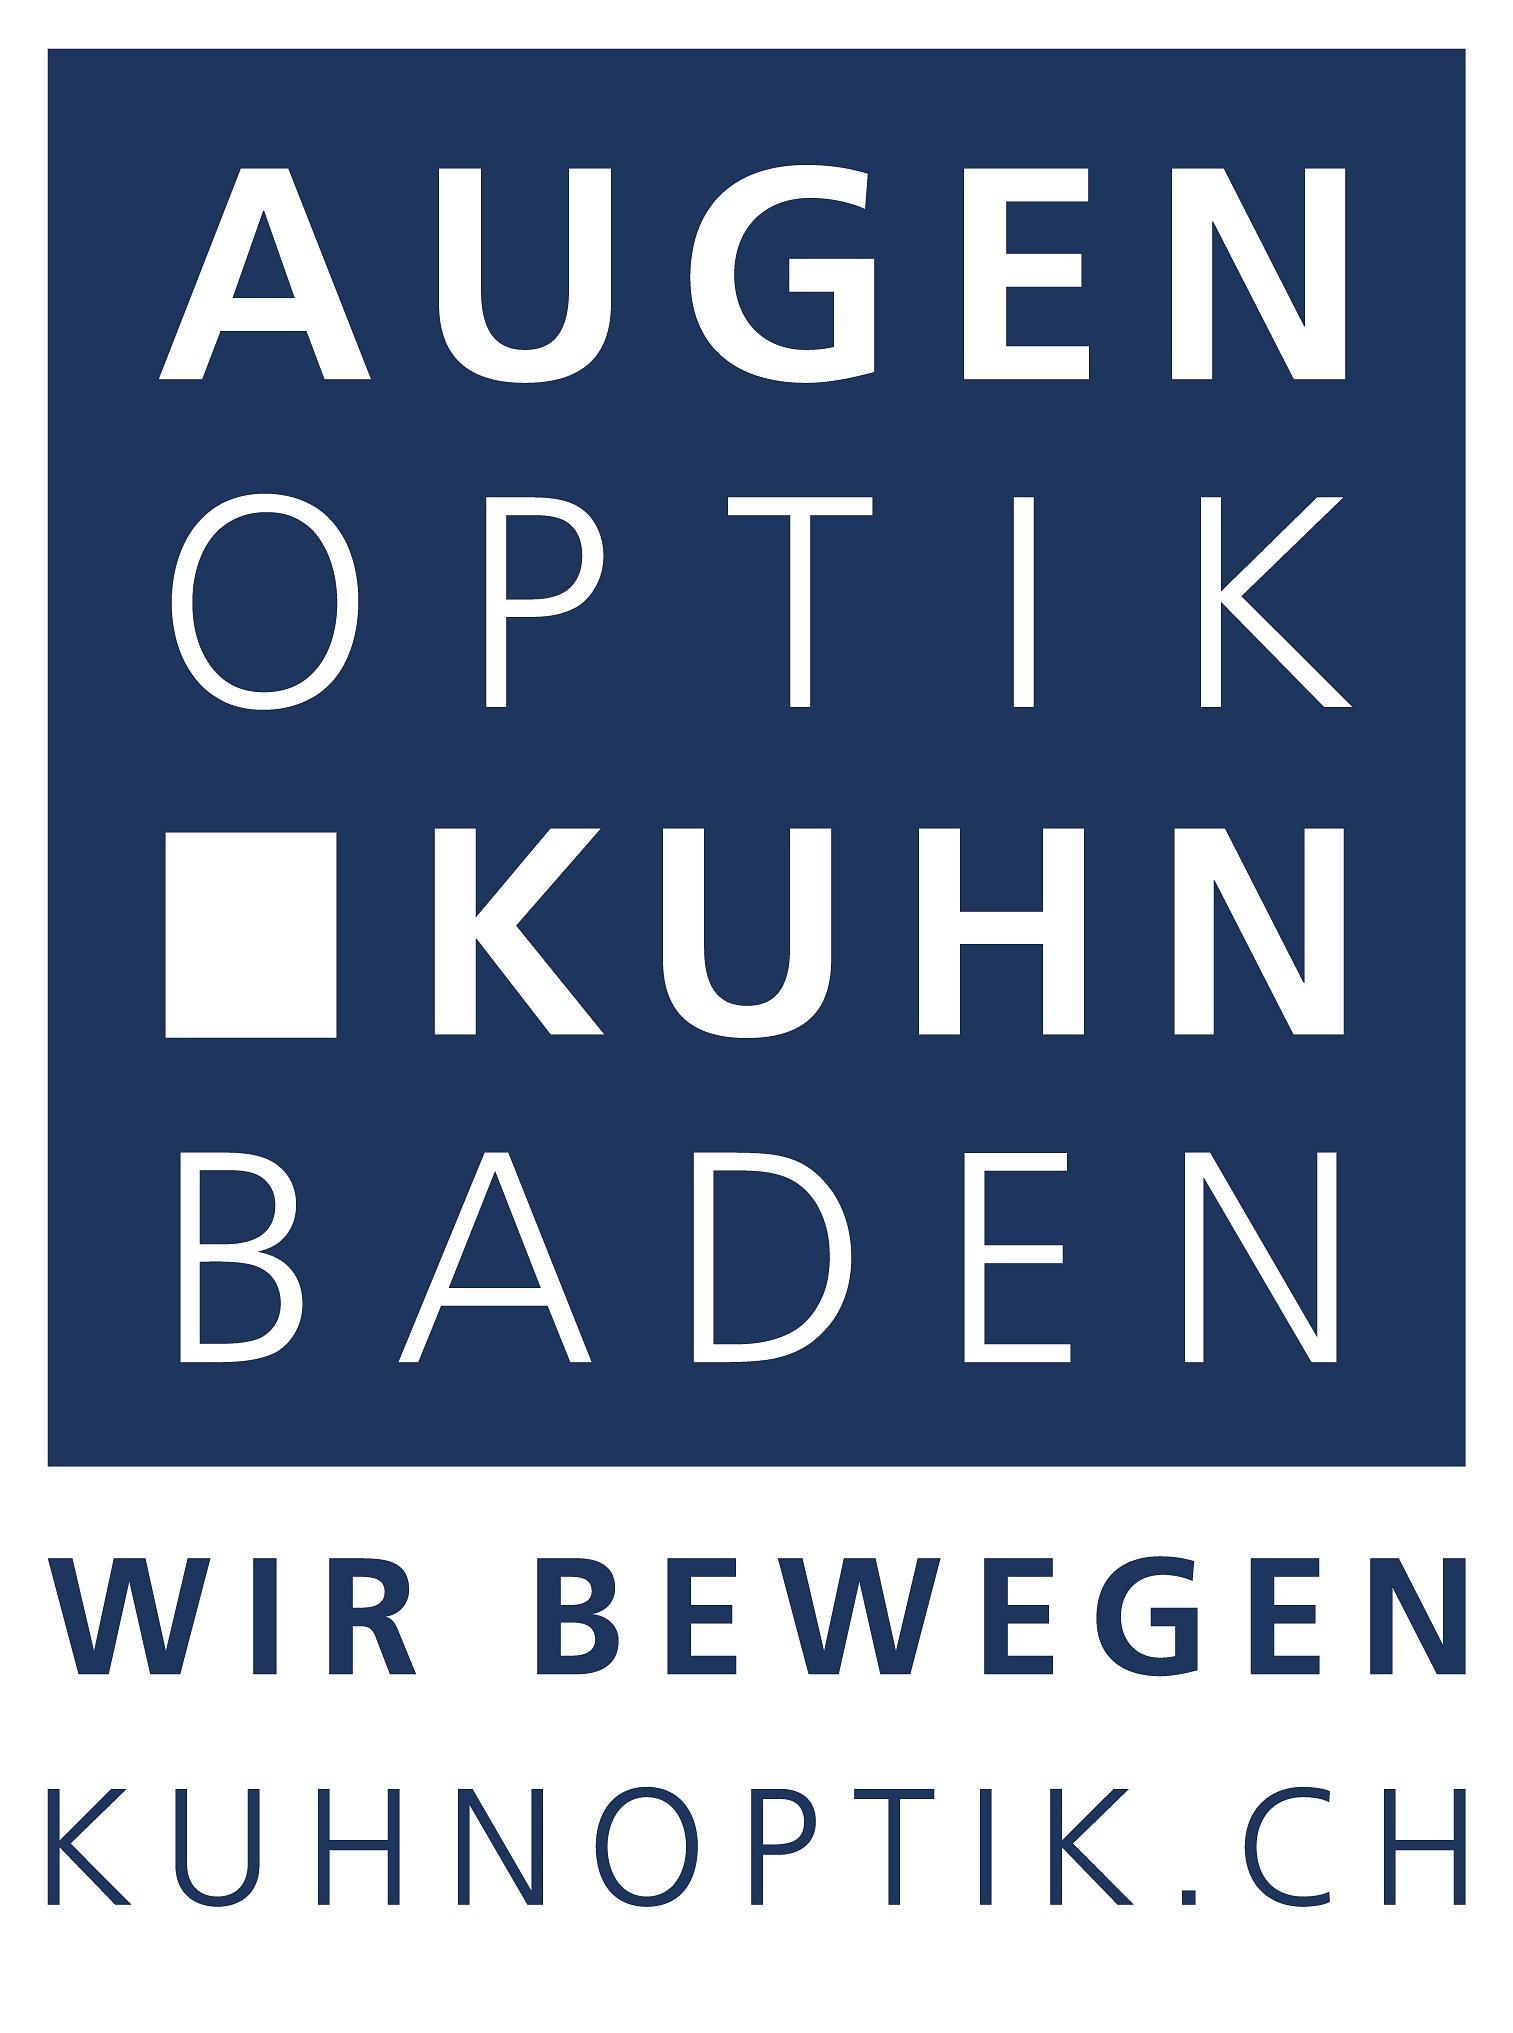 AUGENOPTIK KUHN AG